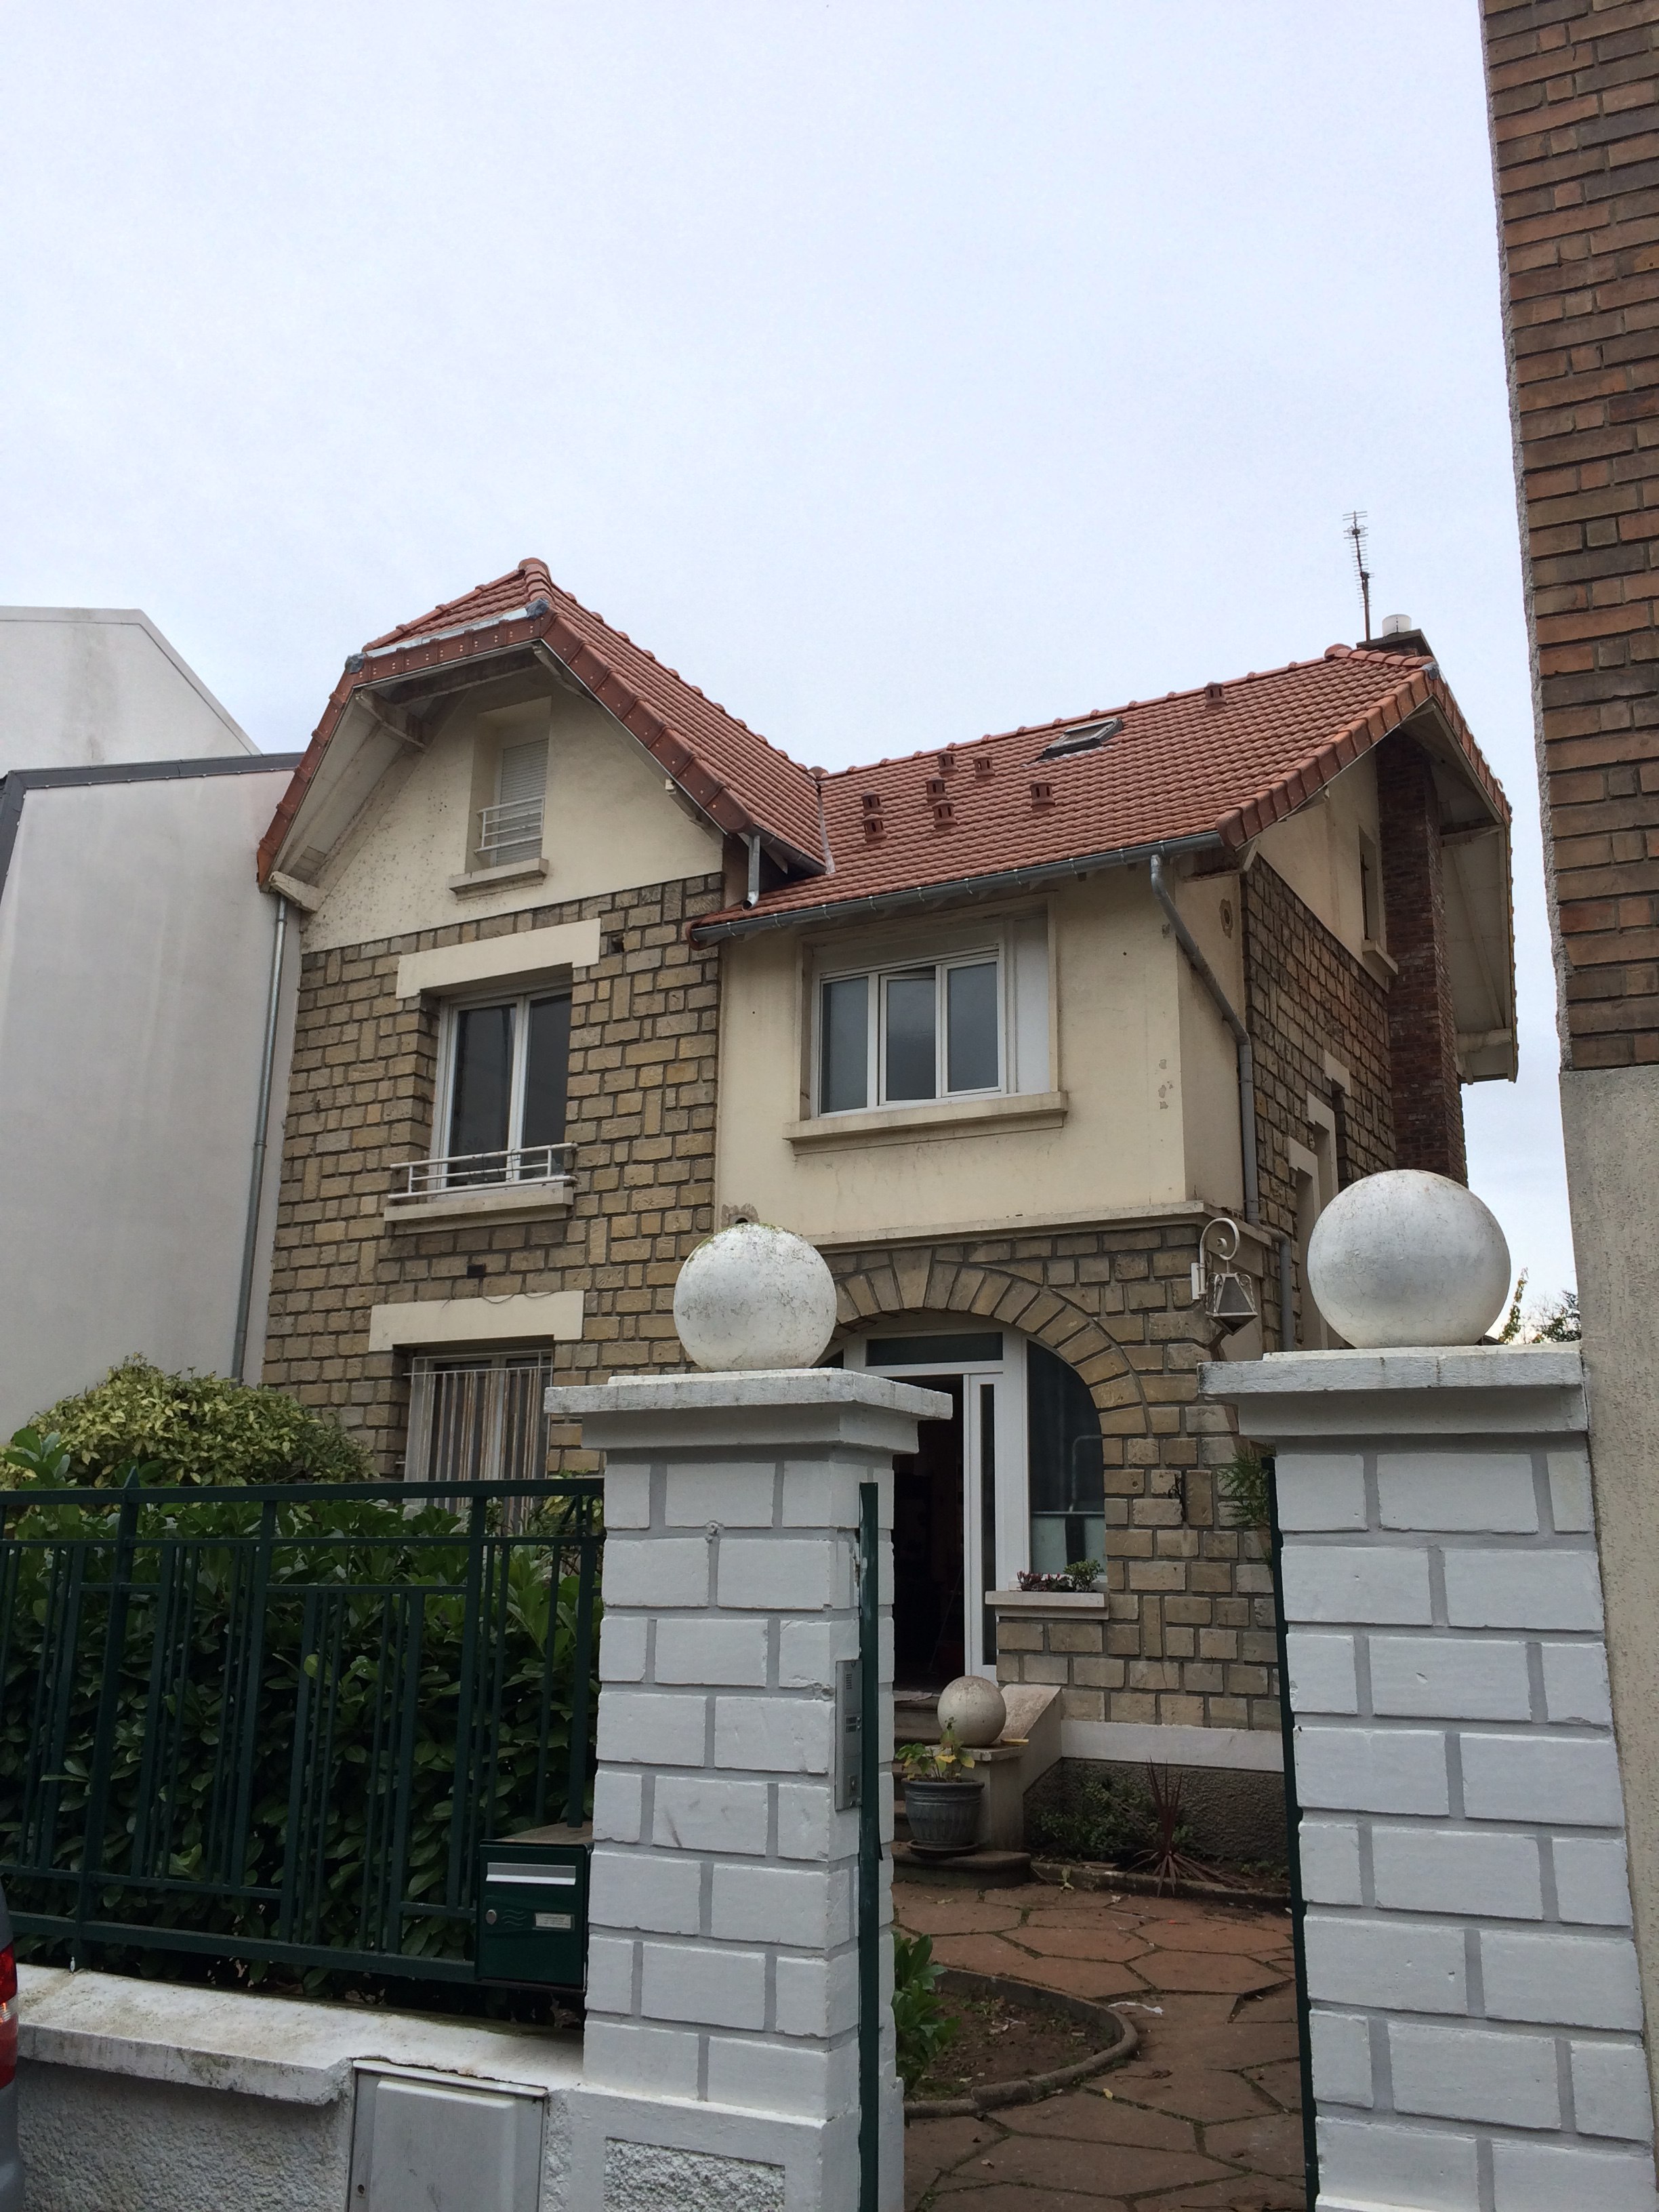 02_facade avant inclinee.JPG